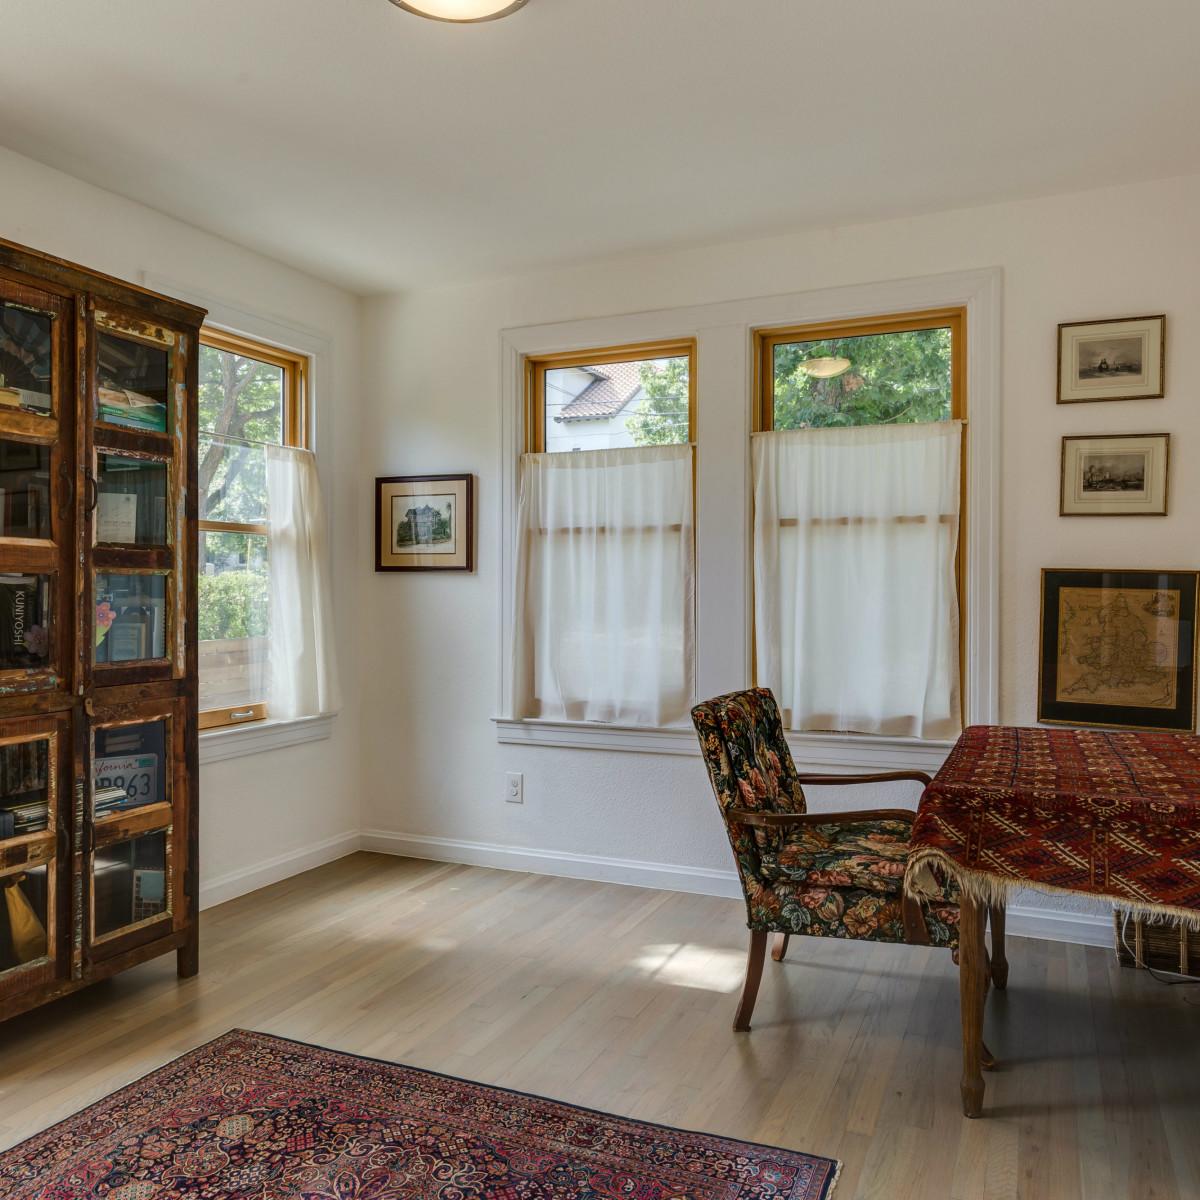 115 W Castano San Antonio house for sale study